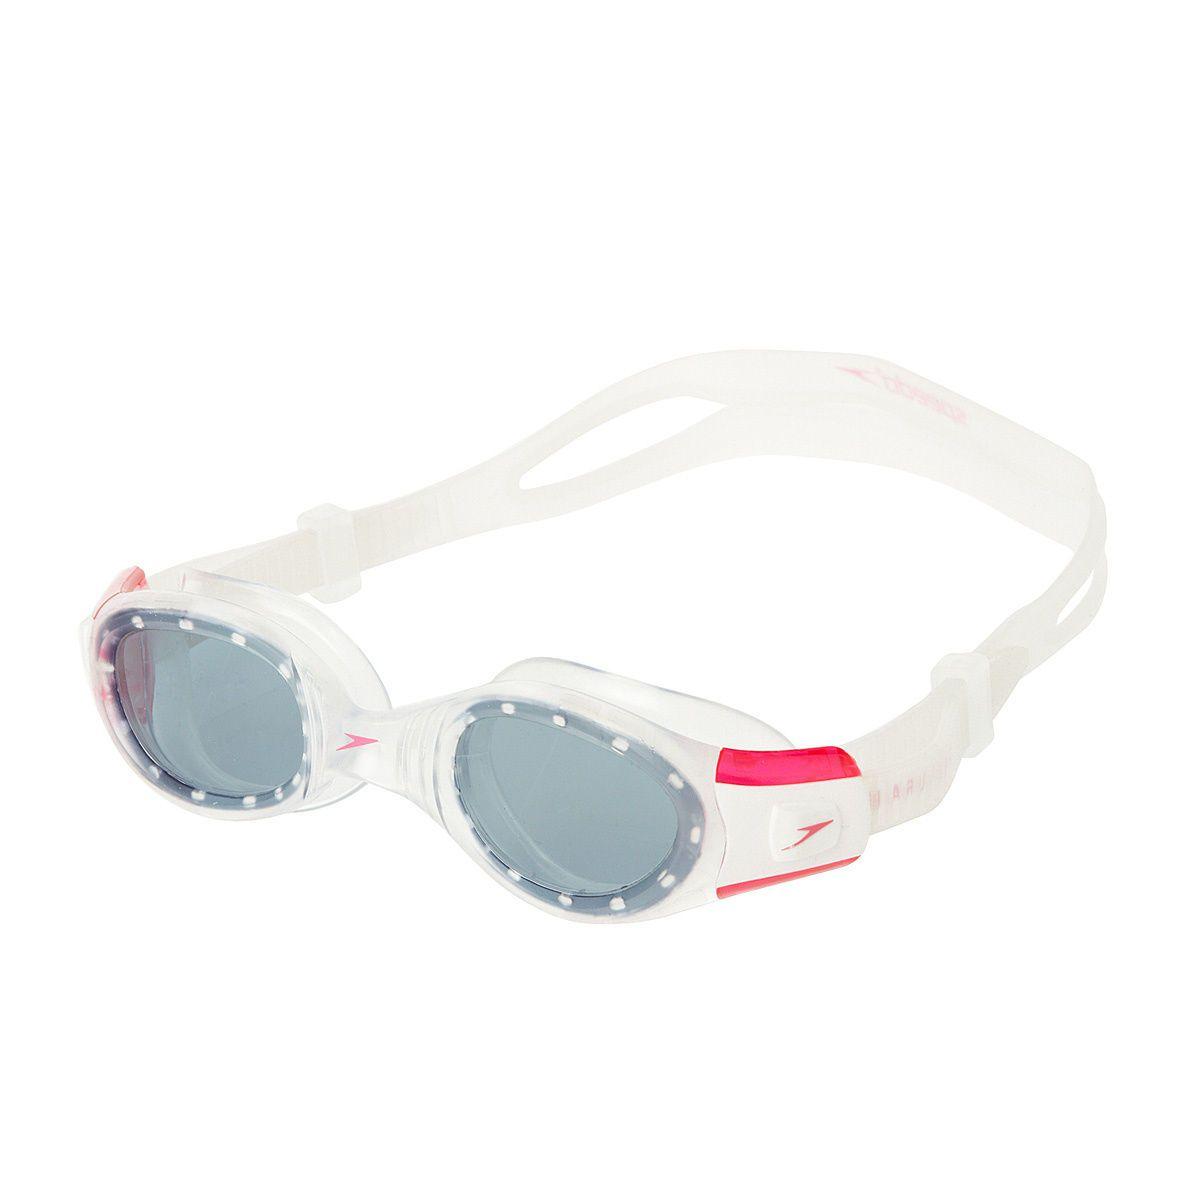 Speedo Goggles - Speedo Futura Biofuse Goggles - Pink/Smoke